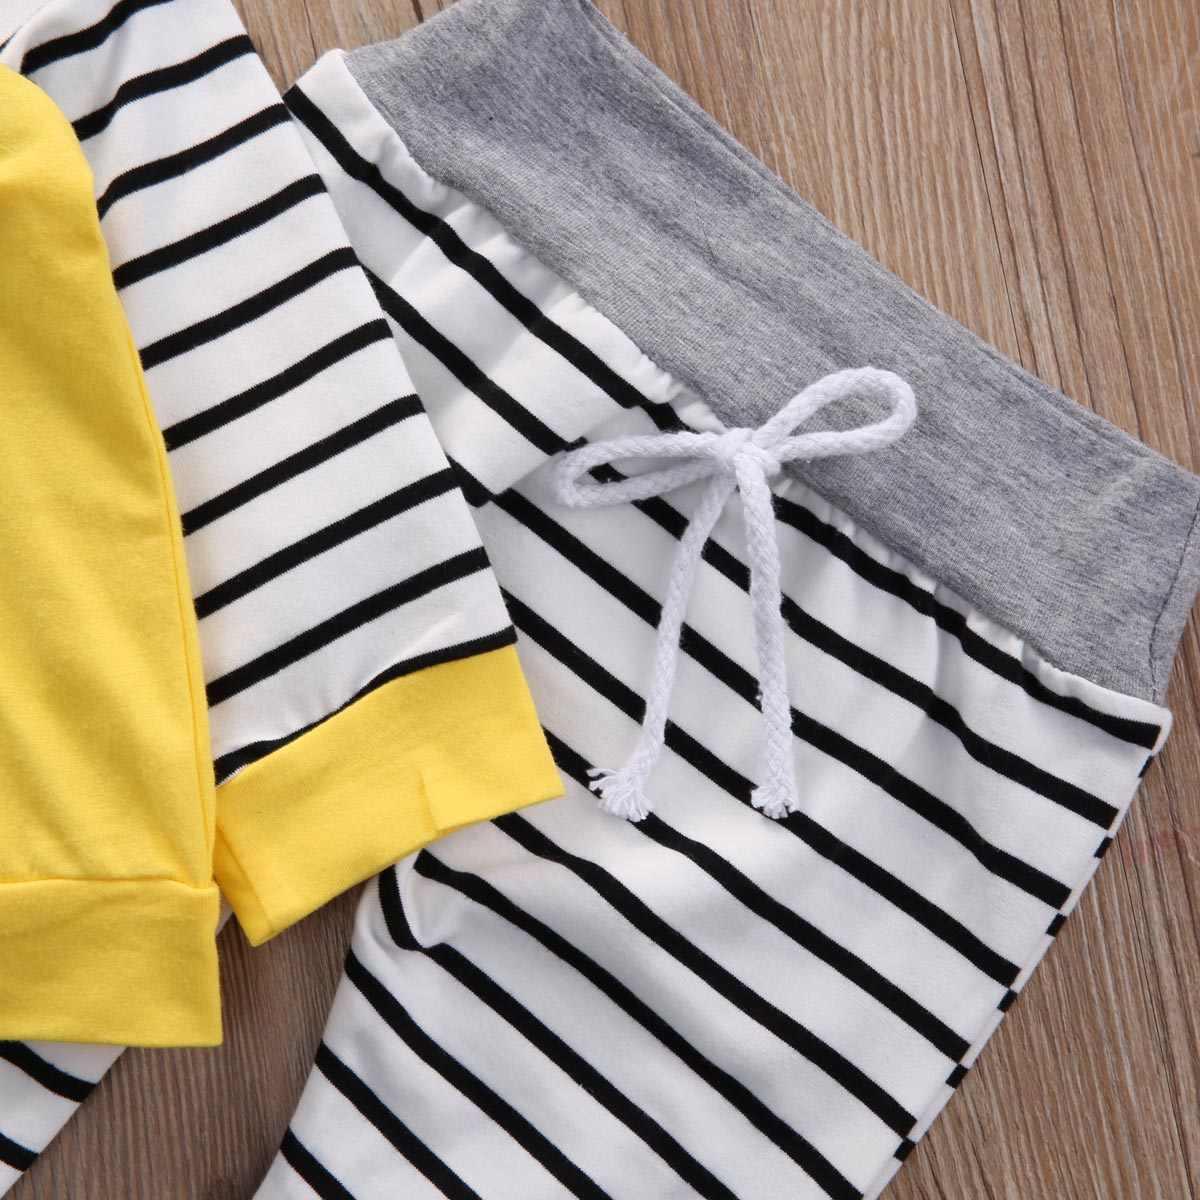 UNS LAGER 2PCS Baby Jungen & Mädchen Batman Mit Kapuze Tops Sweatshirt + Hosen Outfit Kleidung Set